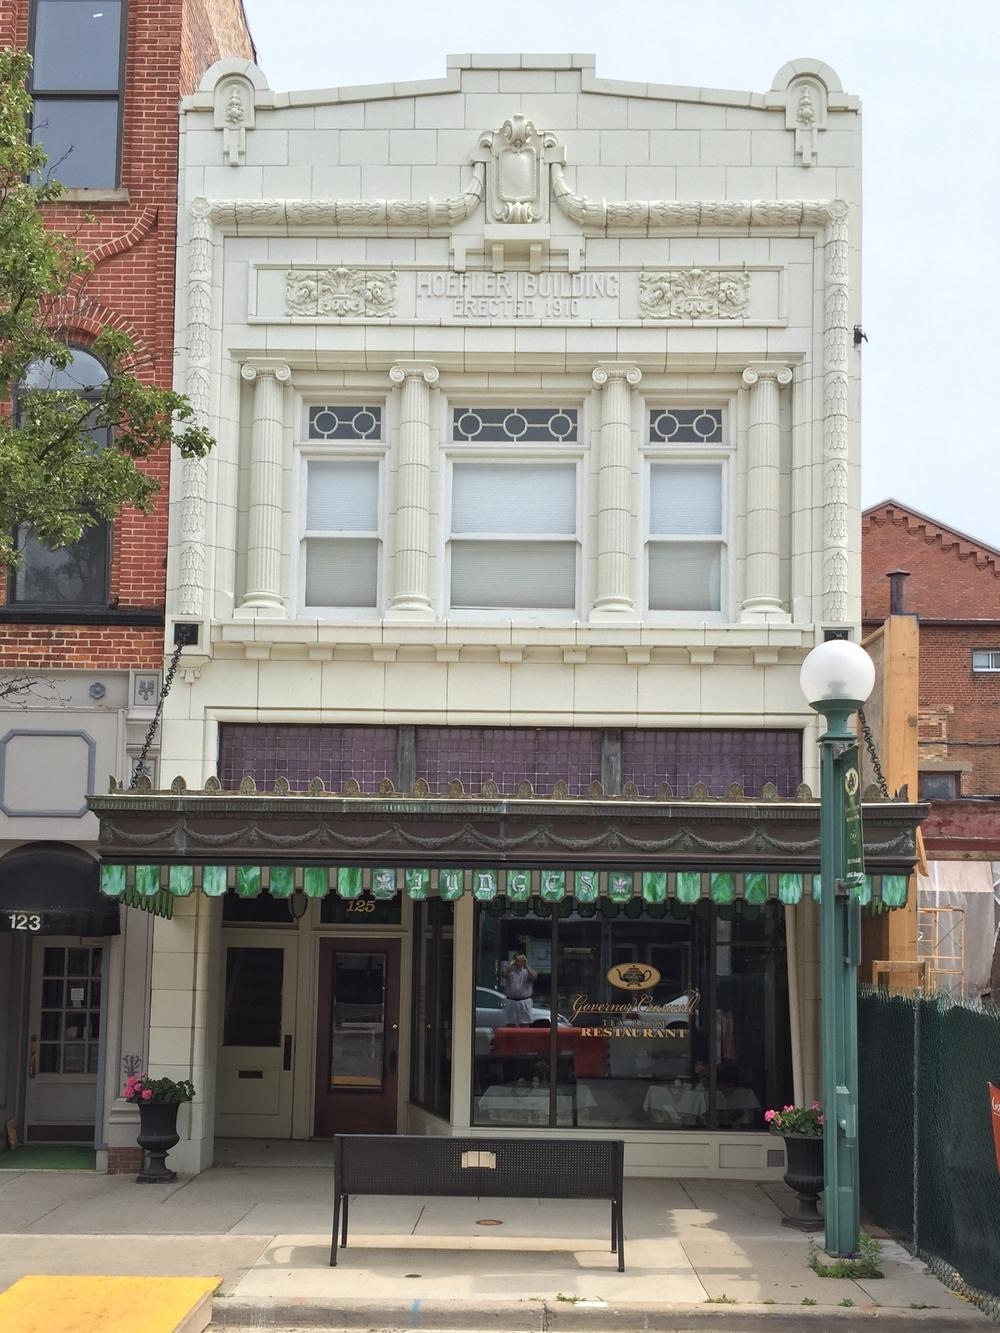 Hoefler Building, 125 East Maumee Street, 1910